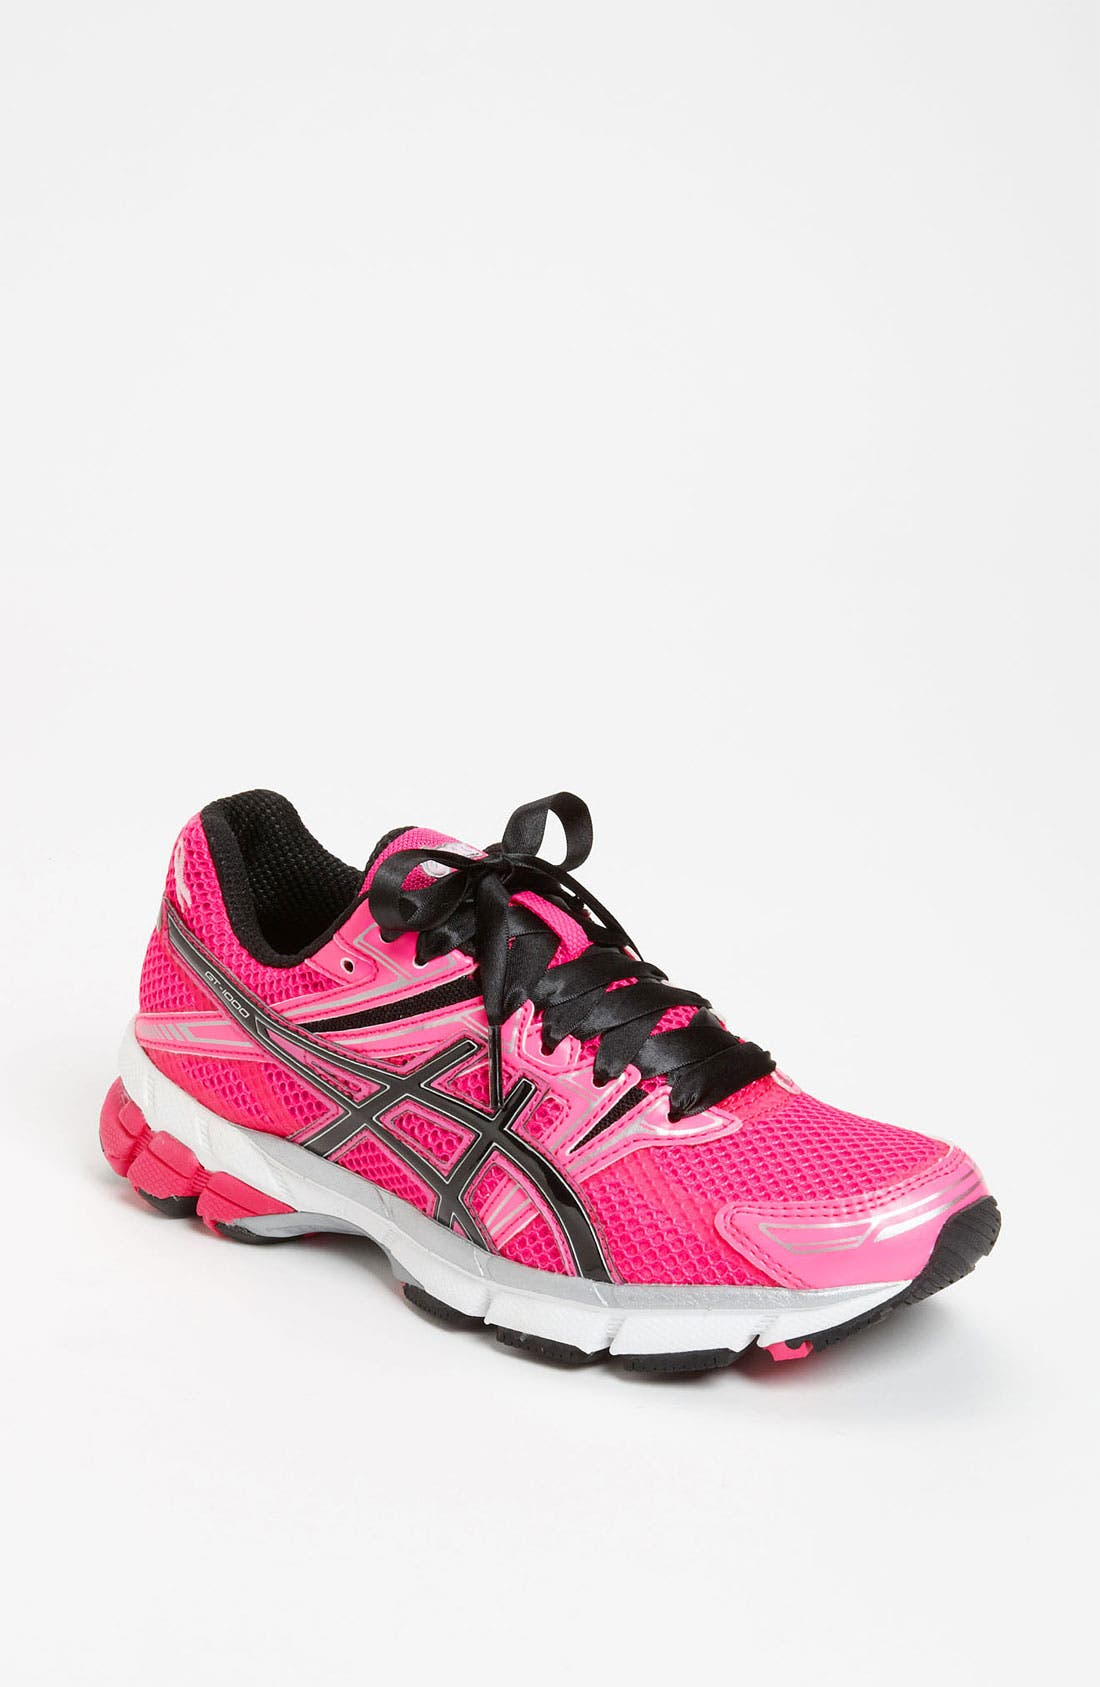 Main Image - ASICS® 'GT 1000 PR' Running Shoe (Women)